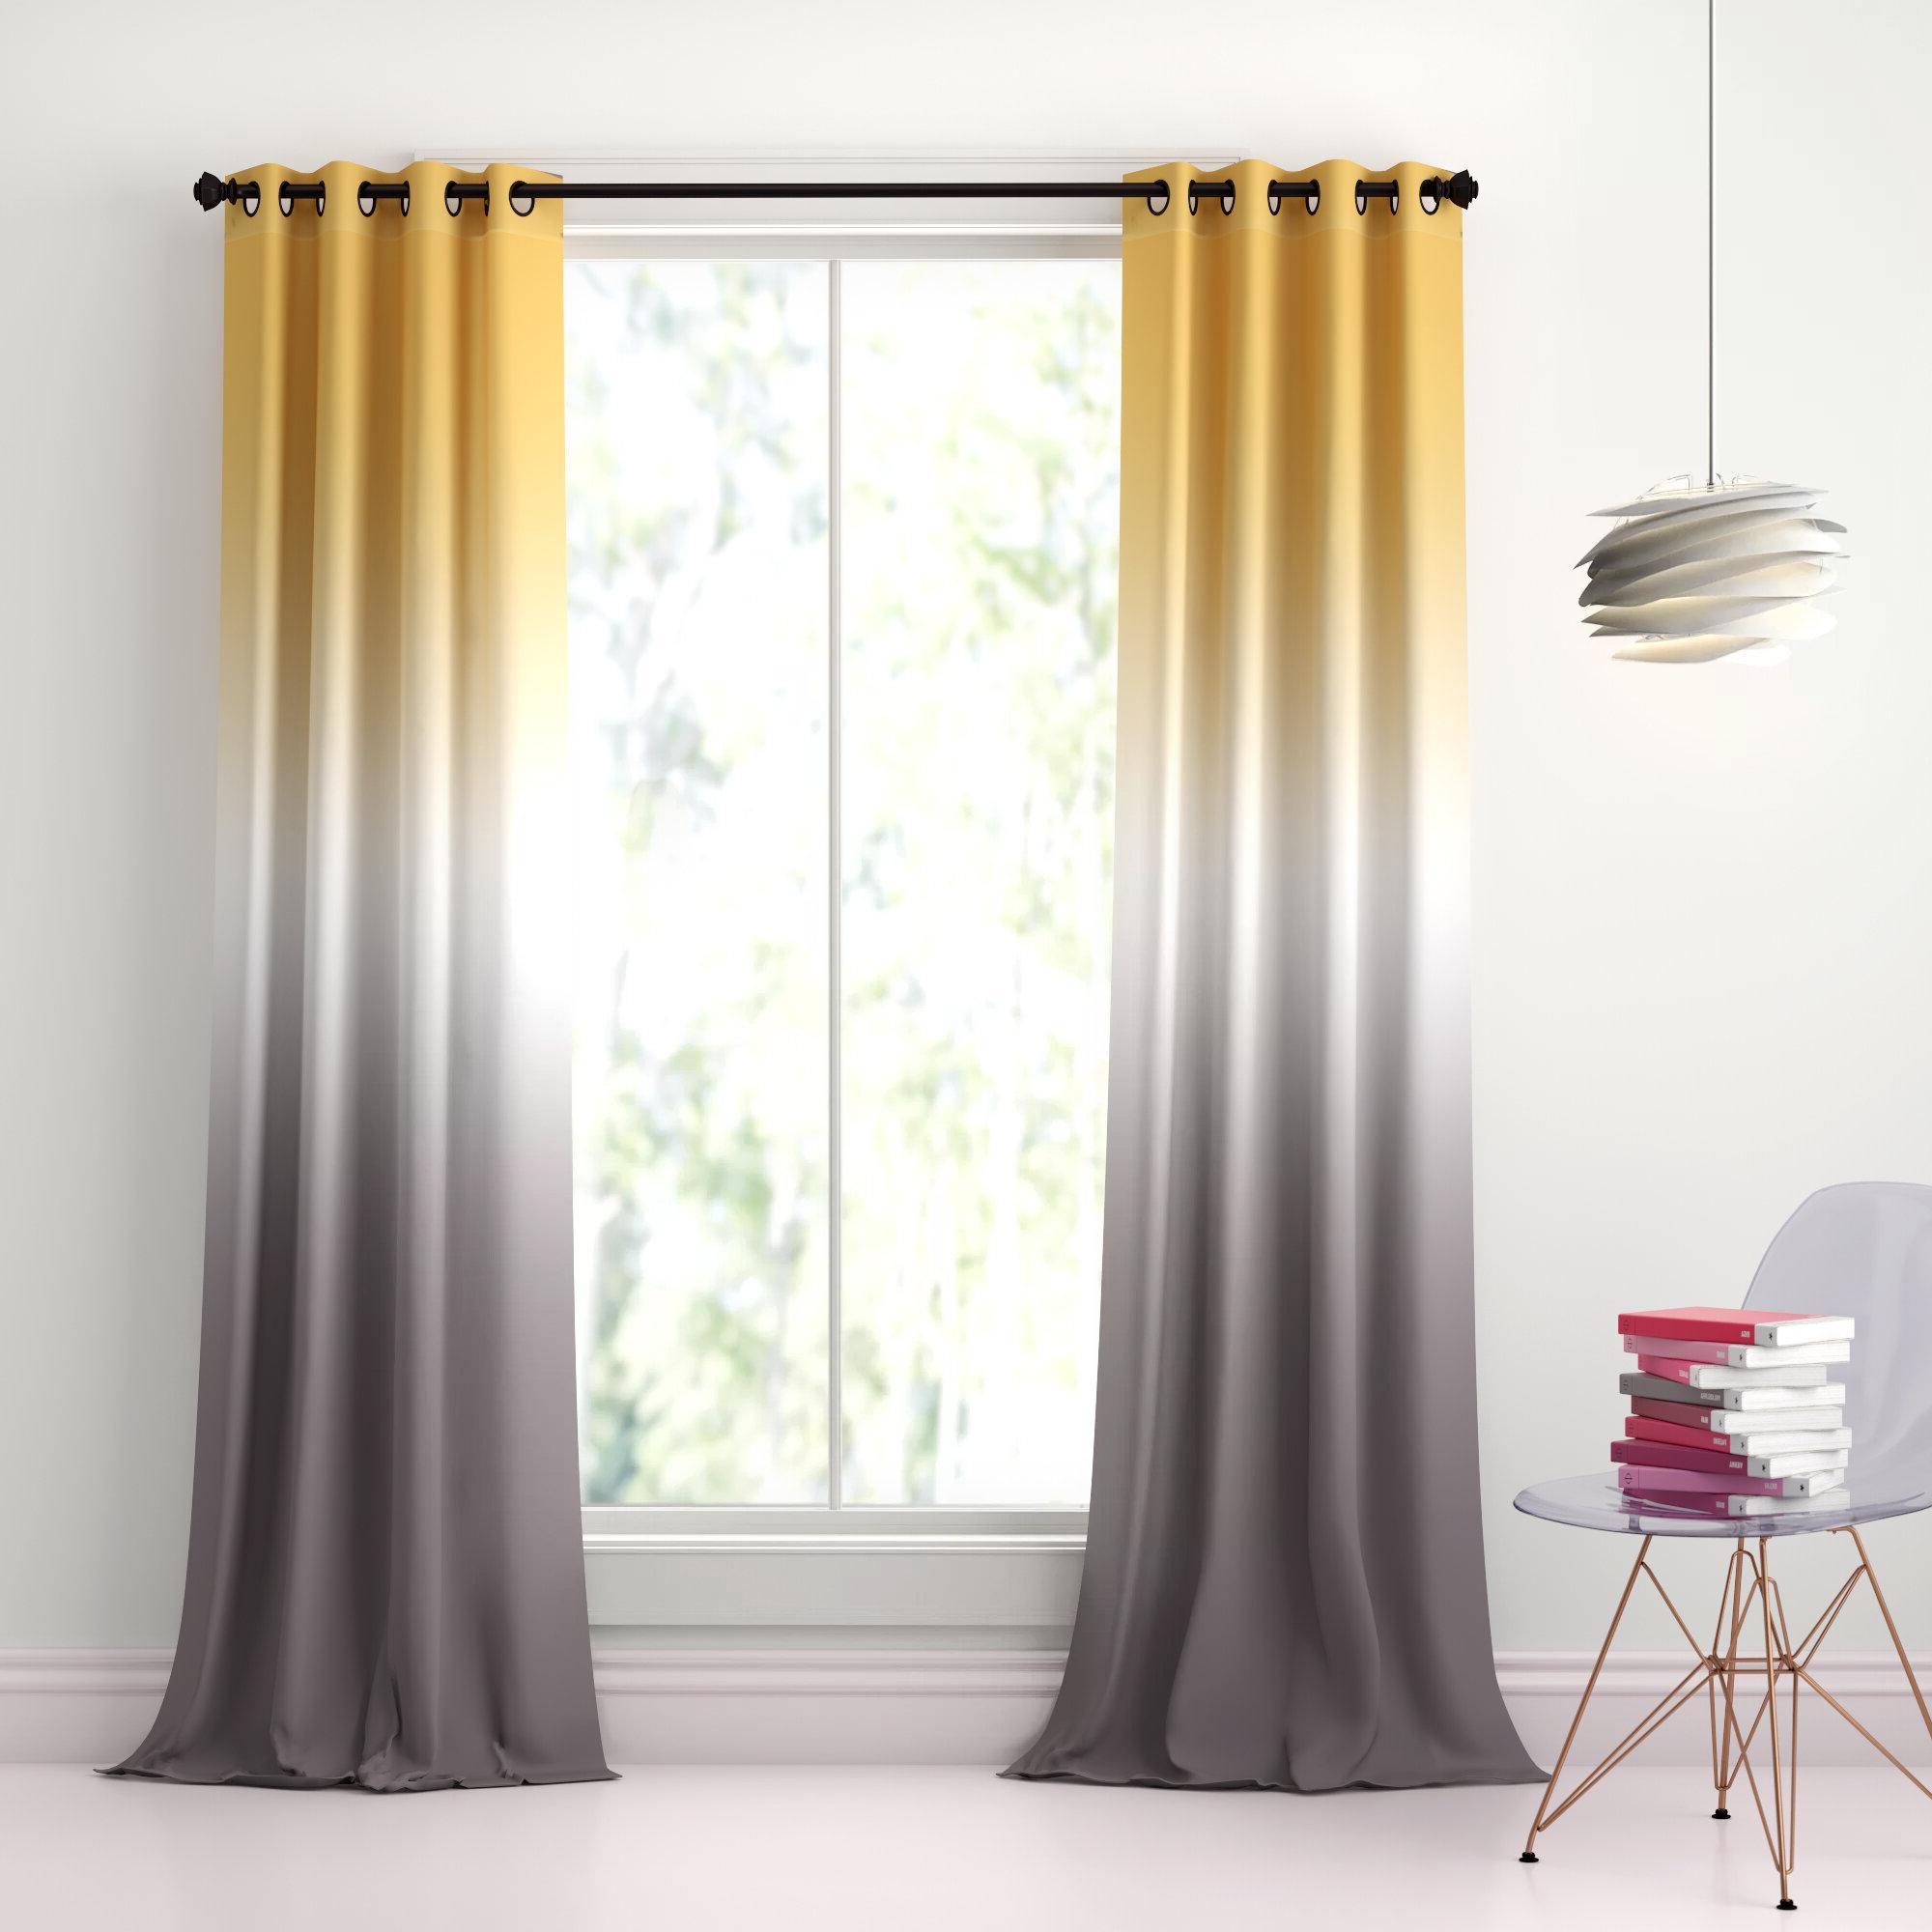 Monte Solid Room Darkening Grommet Panel Pair In Well Liked Mid Century Geo Room Darkening Window Curtain Panel Pairs (View 14 of 22)